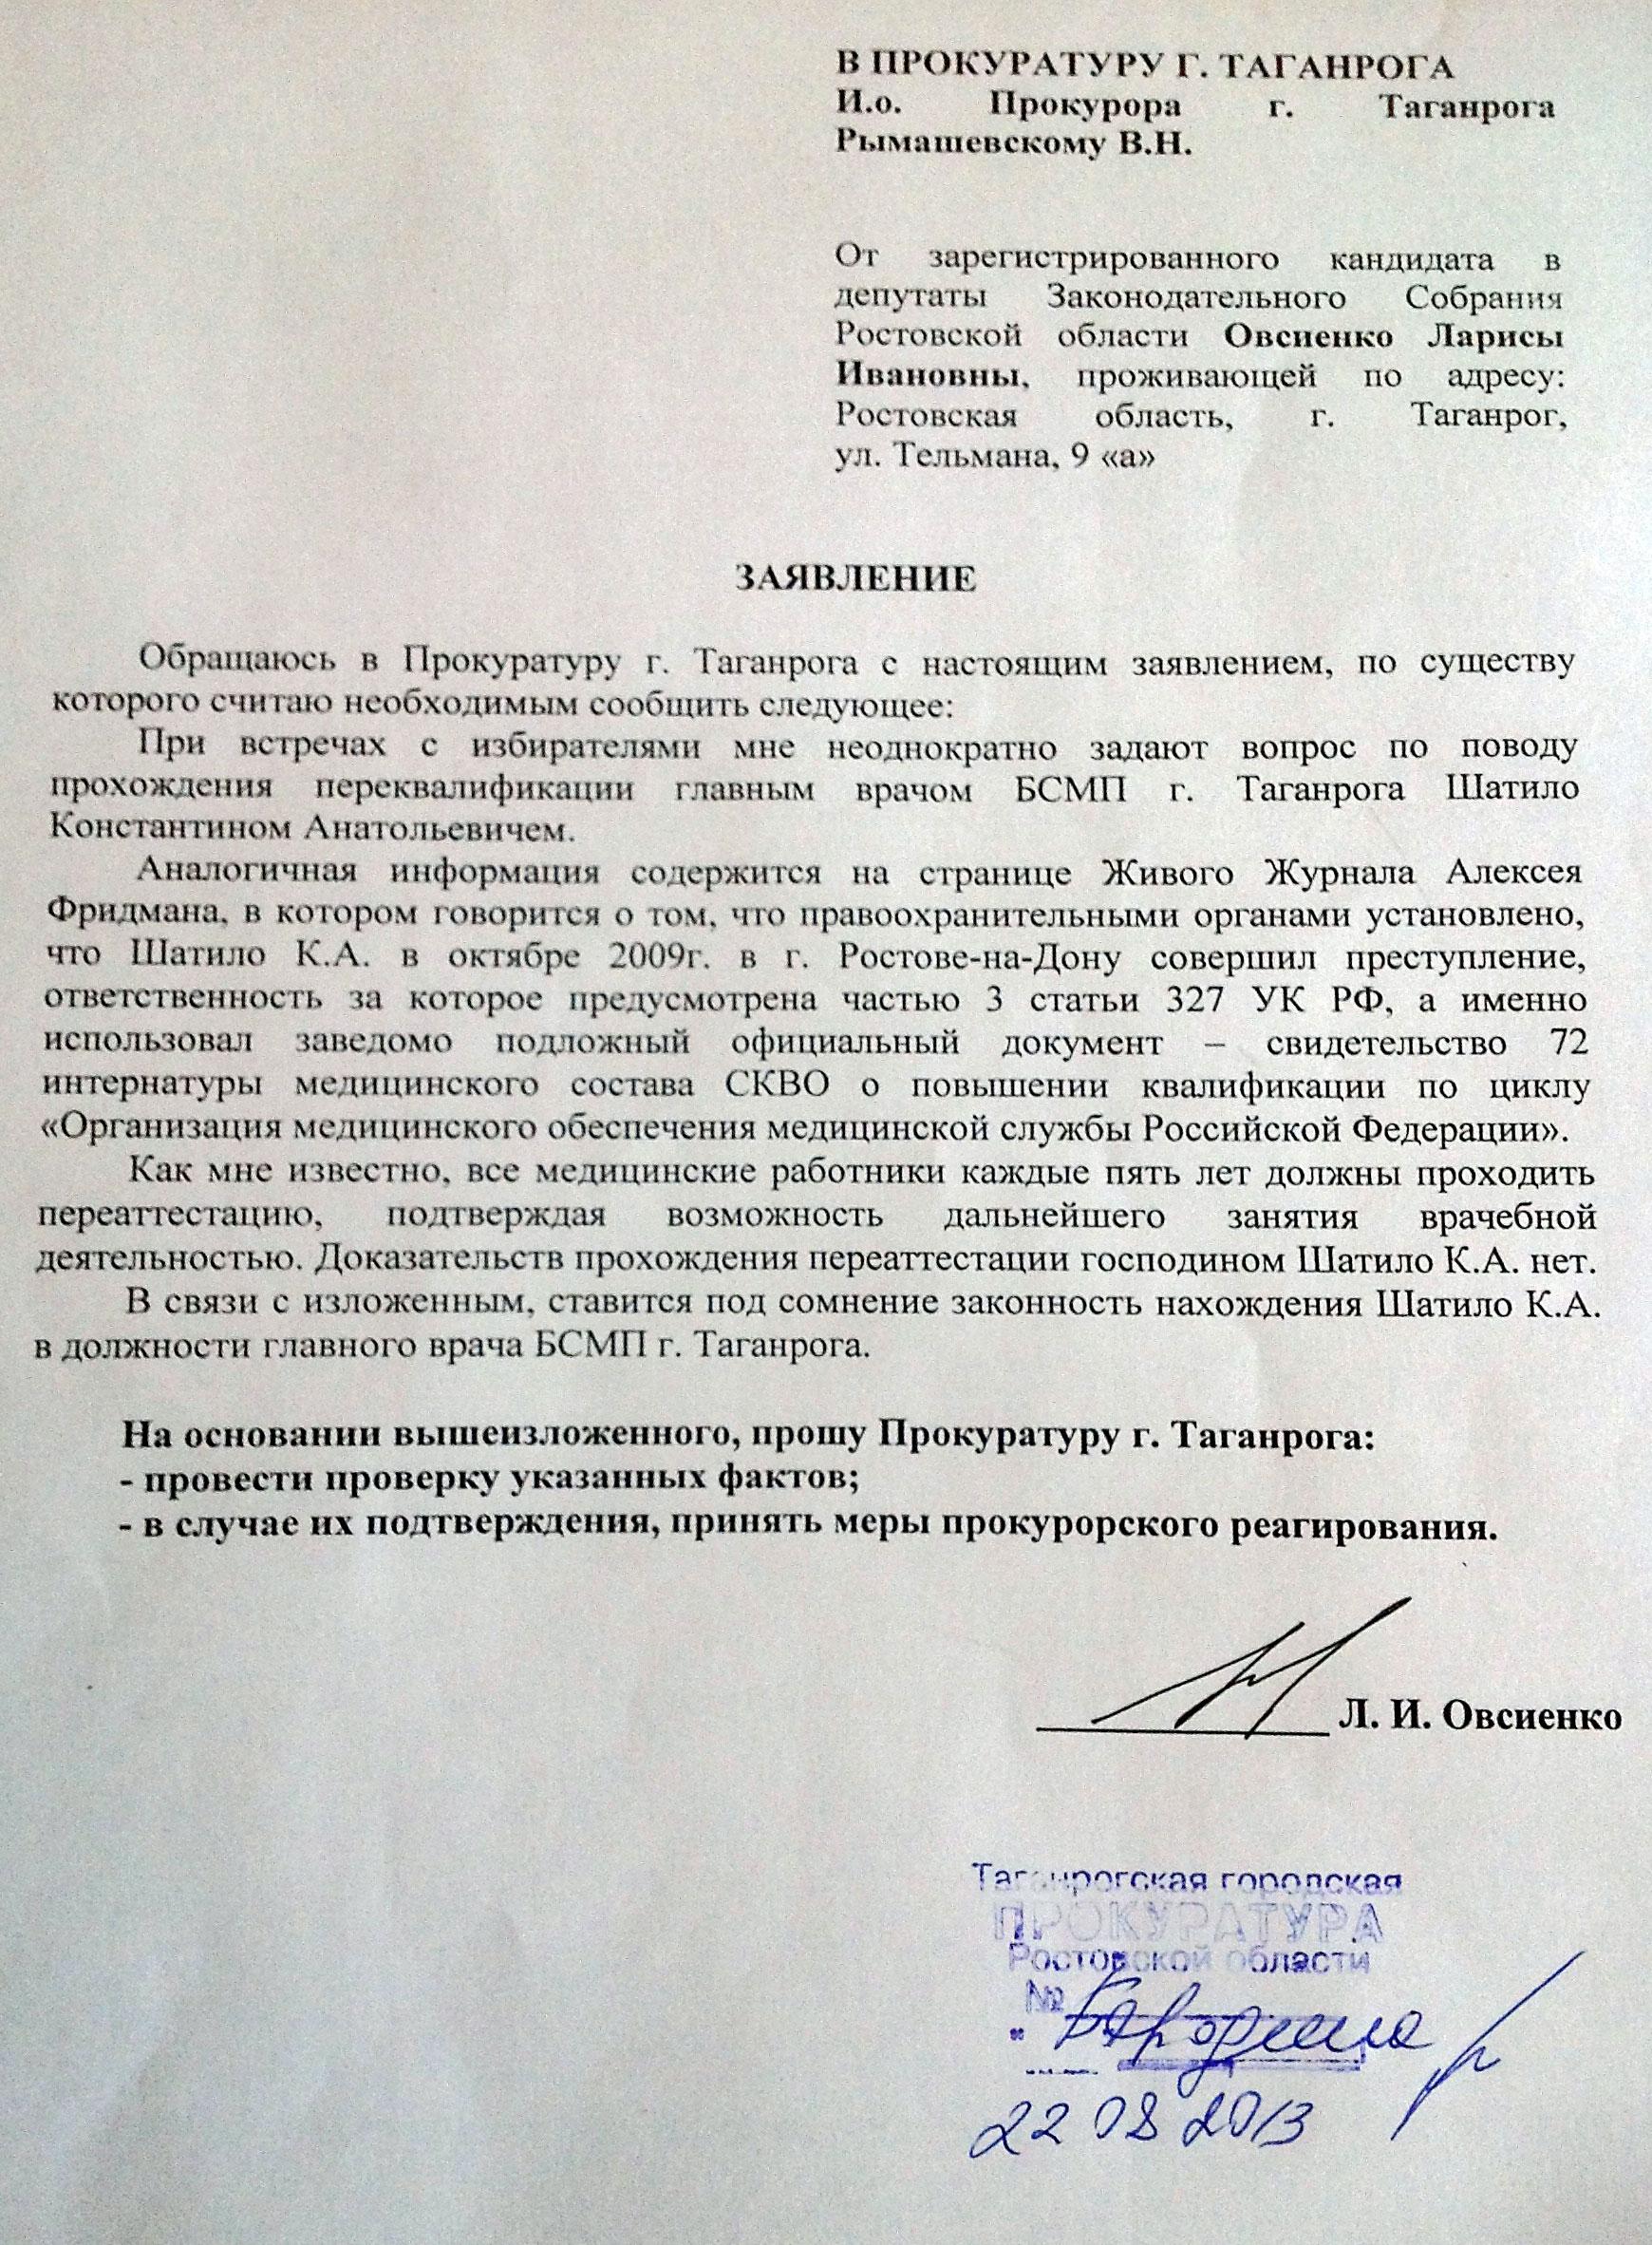 Шатило Таганрог БСМП уголовное дело